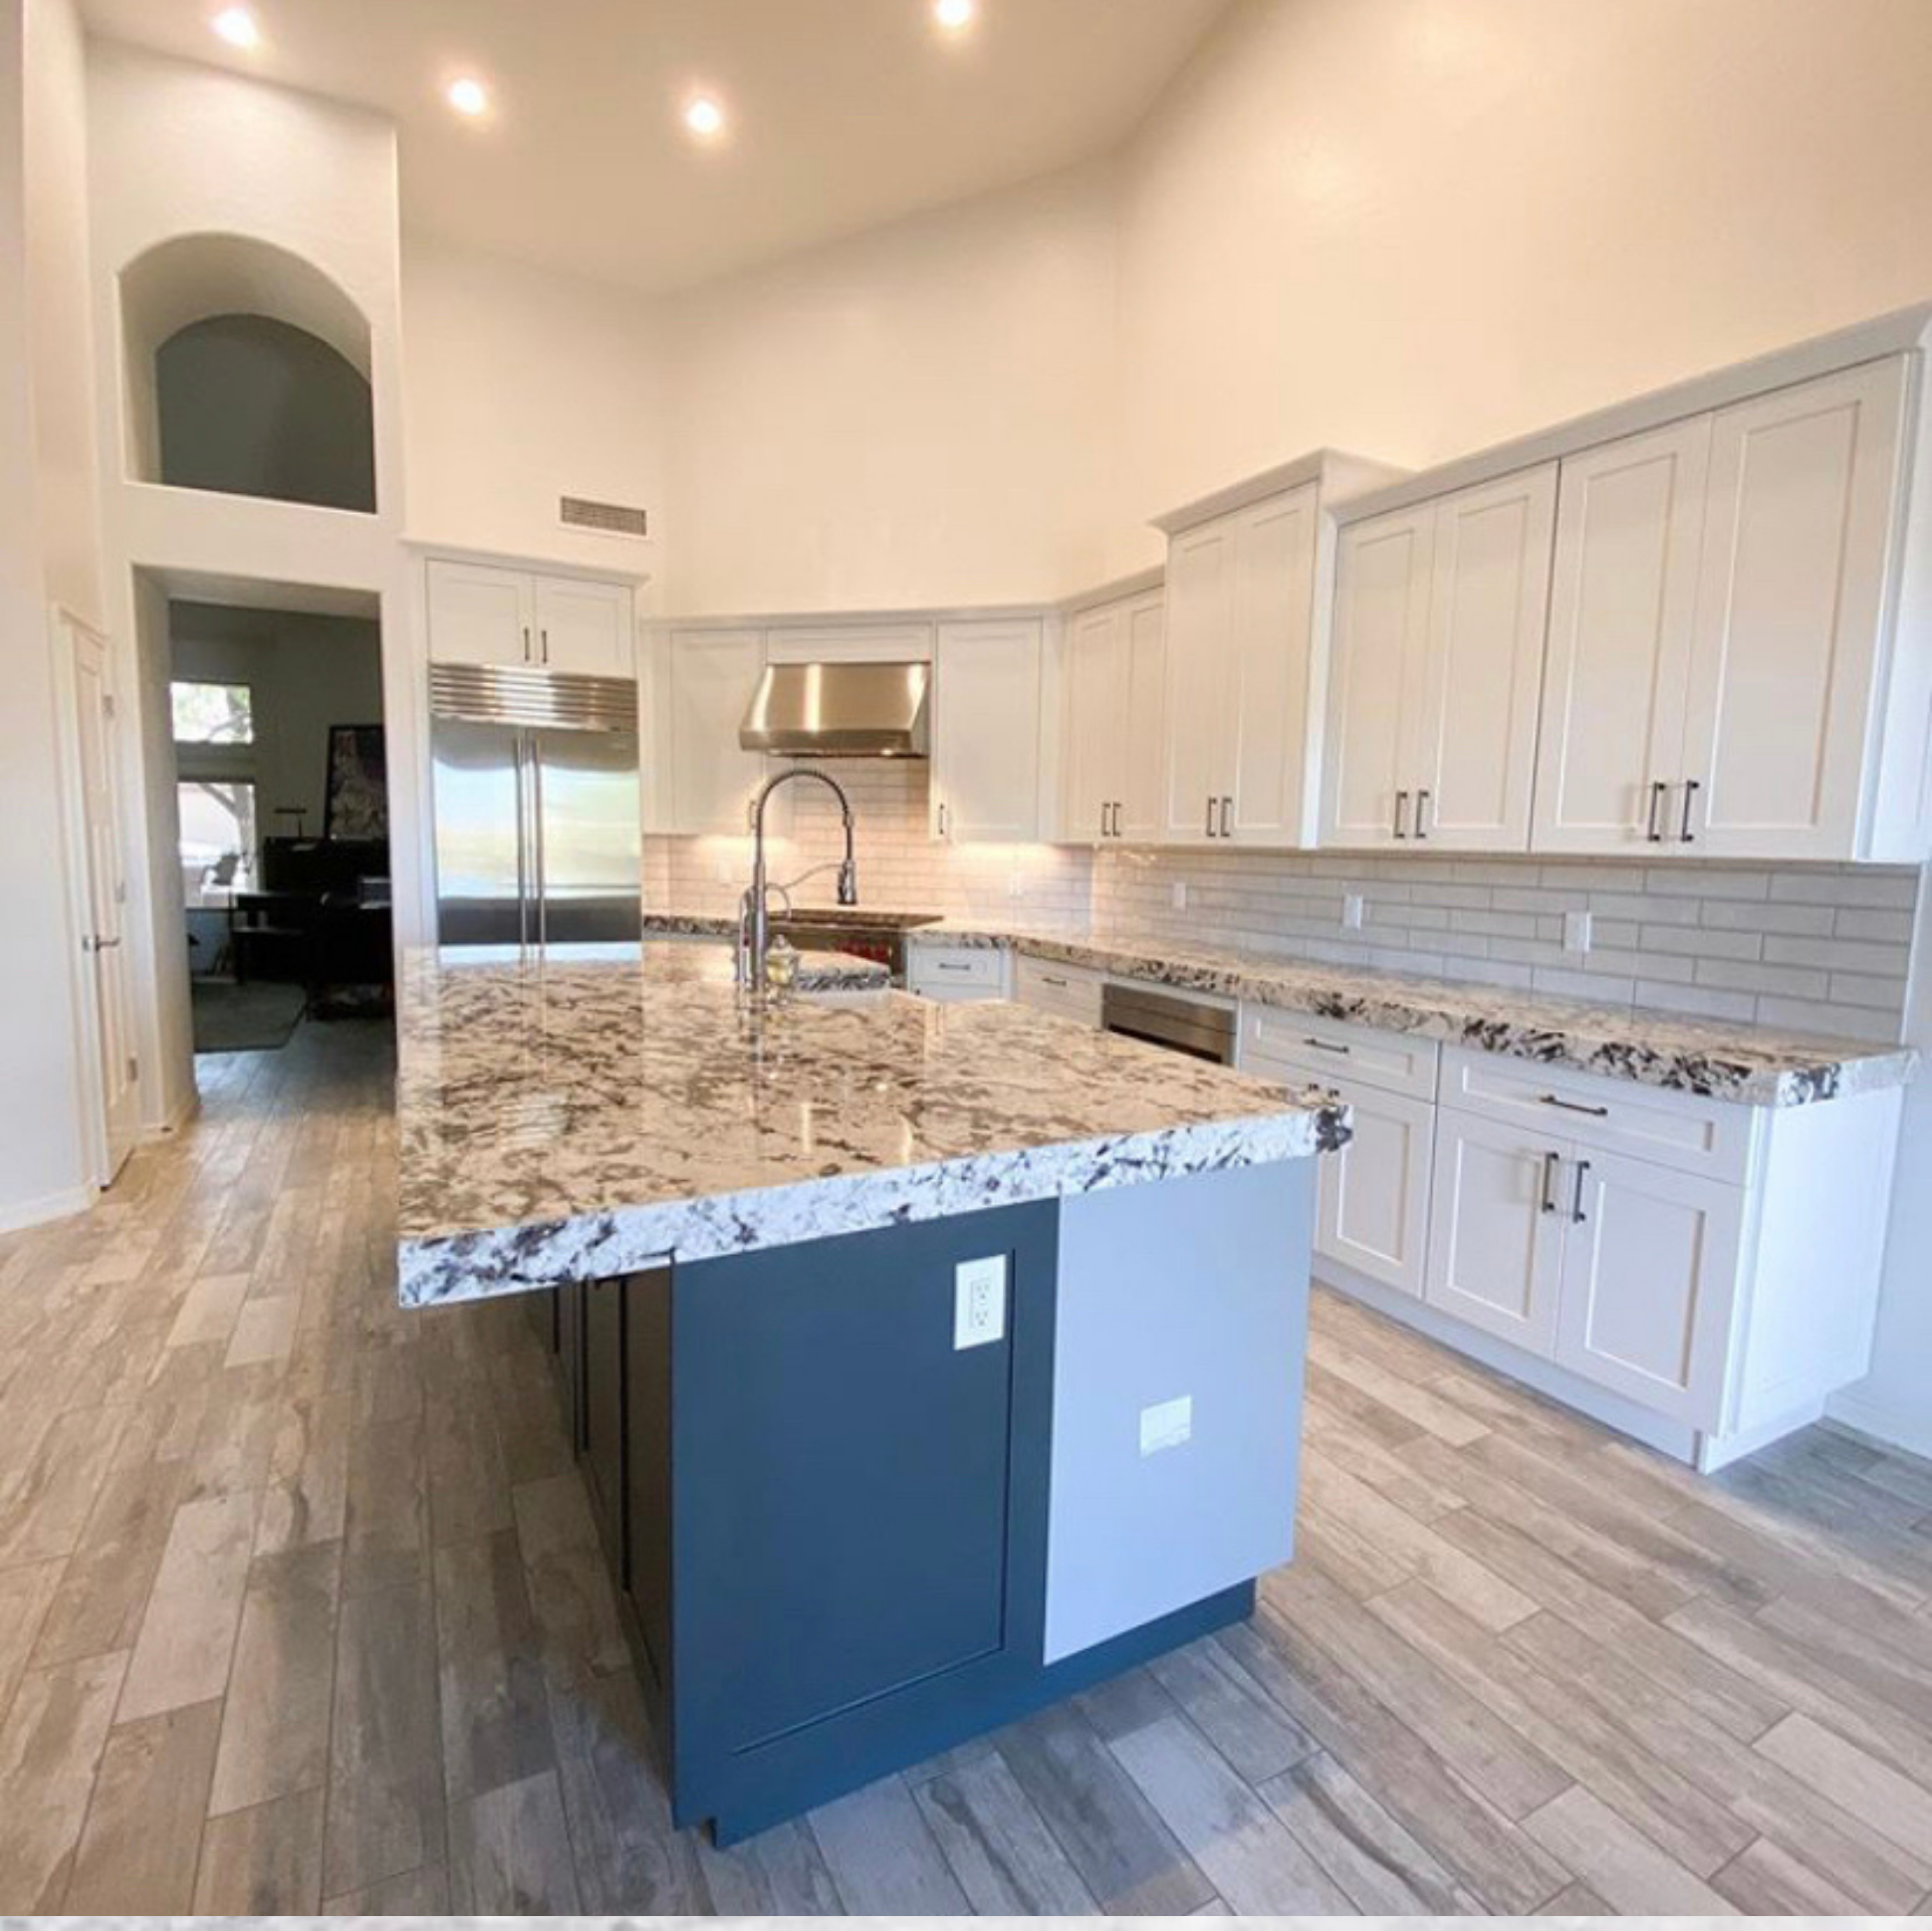 Interior Design - Cabinet Design - Arizona & Colorado